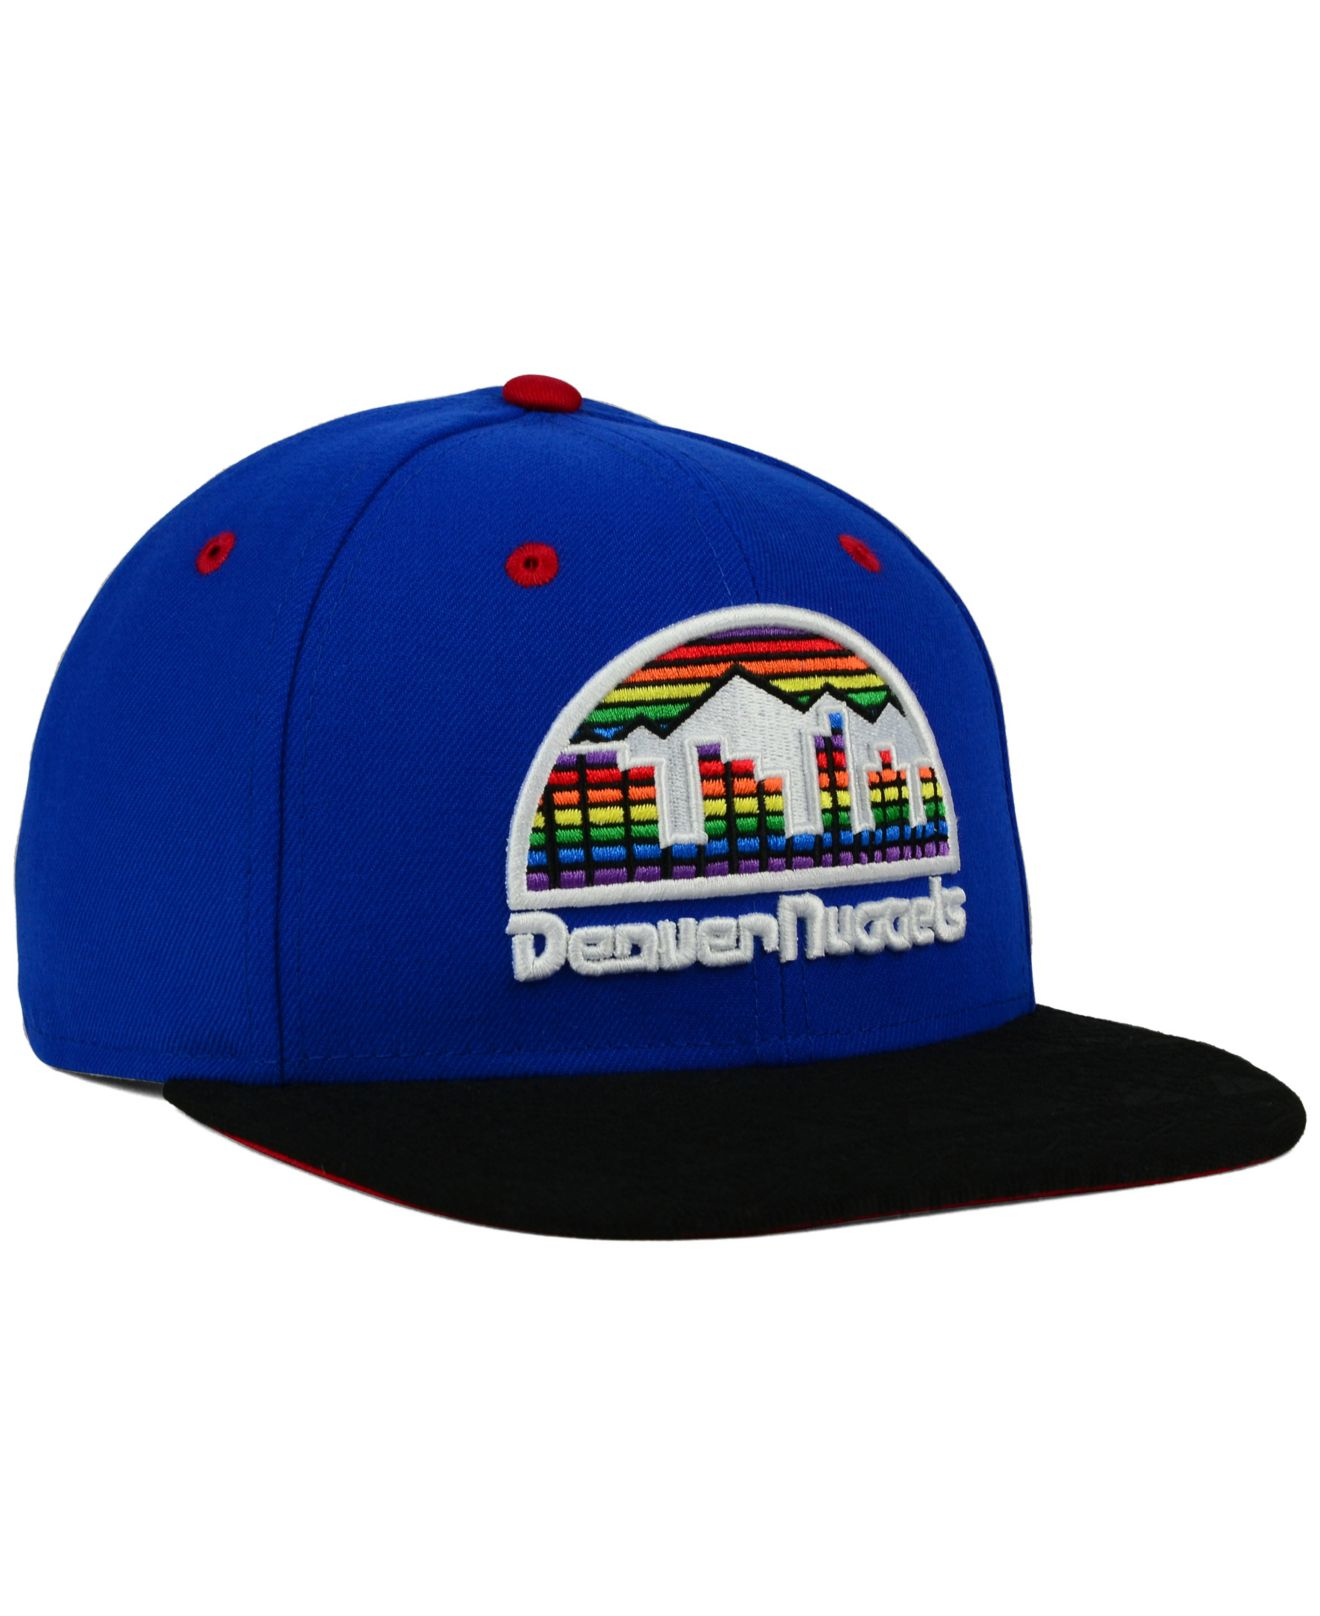 Lyst - KTZ Denver Nuggets Tone 9fifty Snapback Cap in Blue for Men b4412d11c053